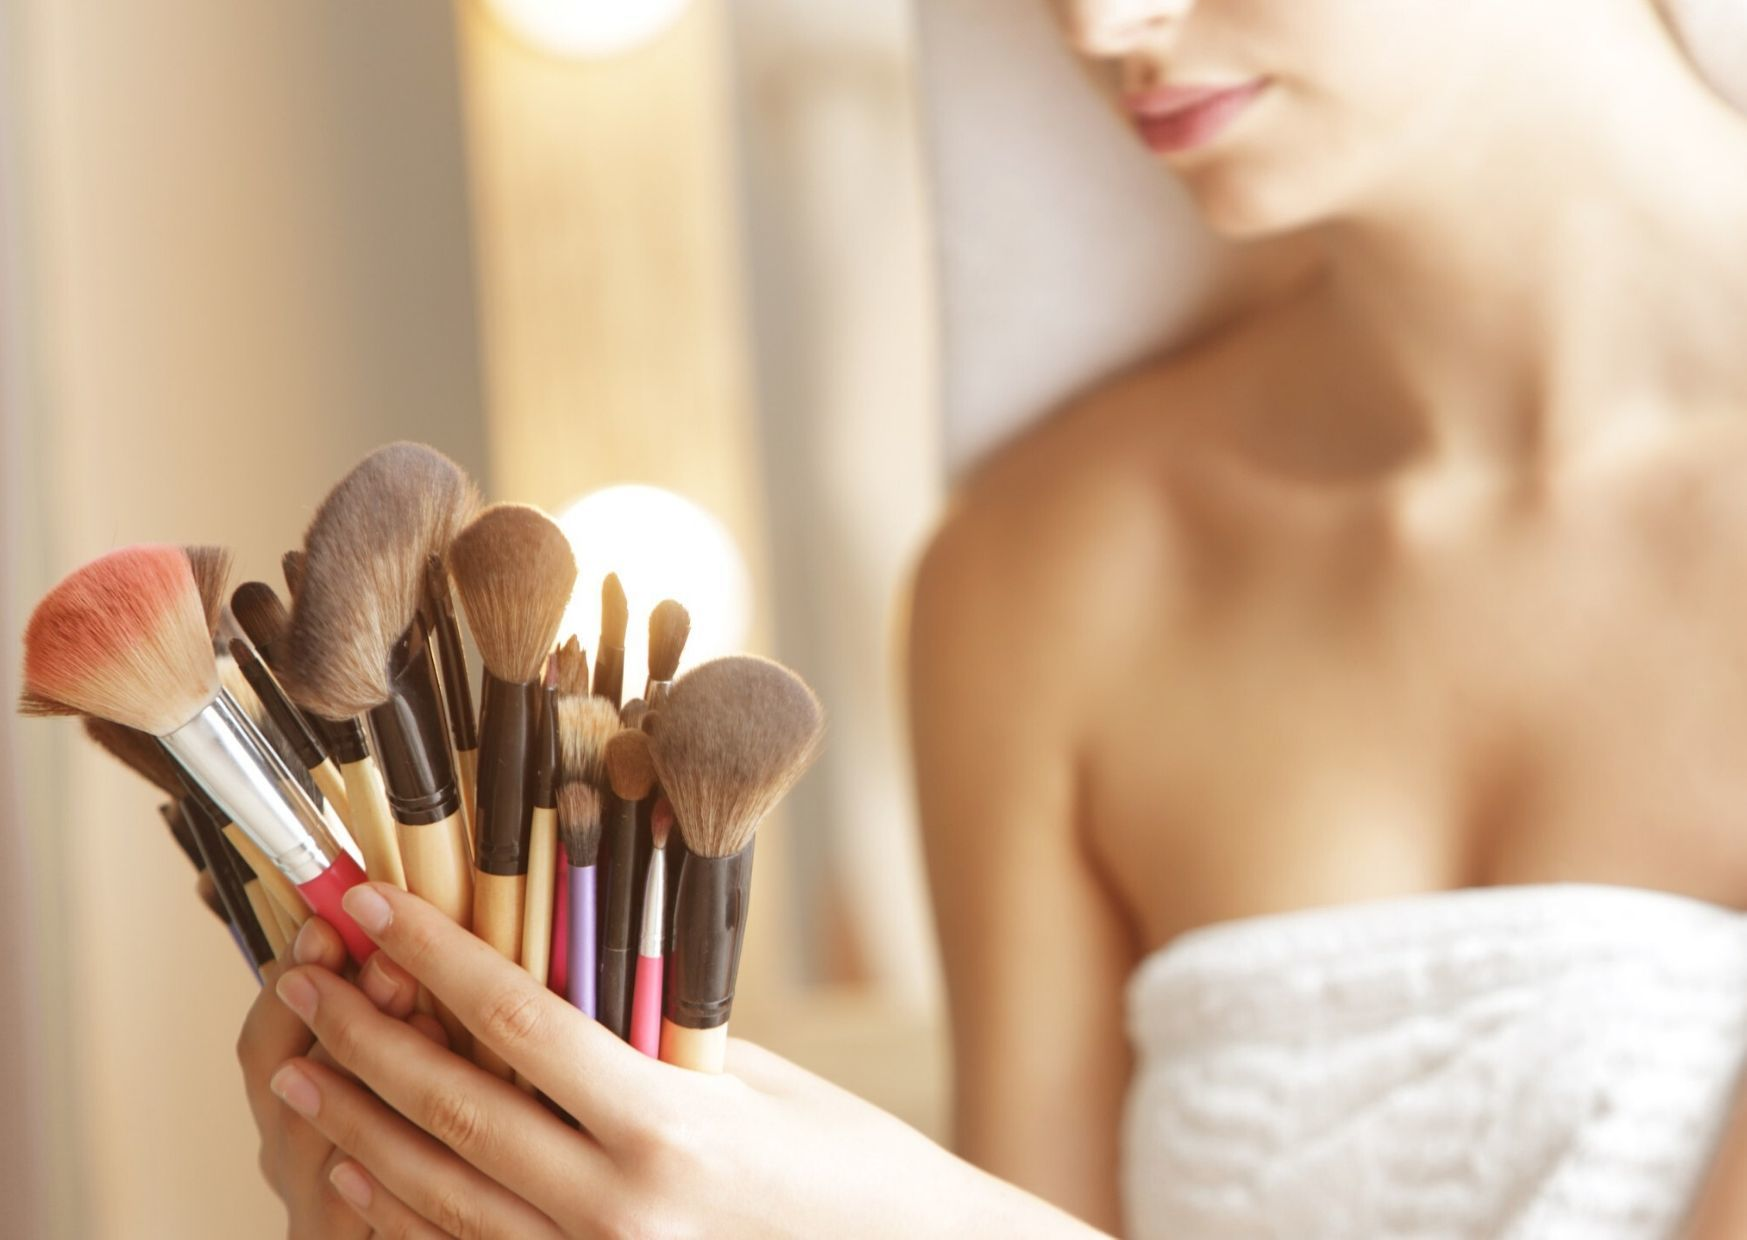 Jangan Ulangi! Ini 5 Kesalahan Makeup yang Membuat Kamu Jerawatan